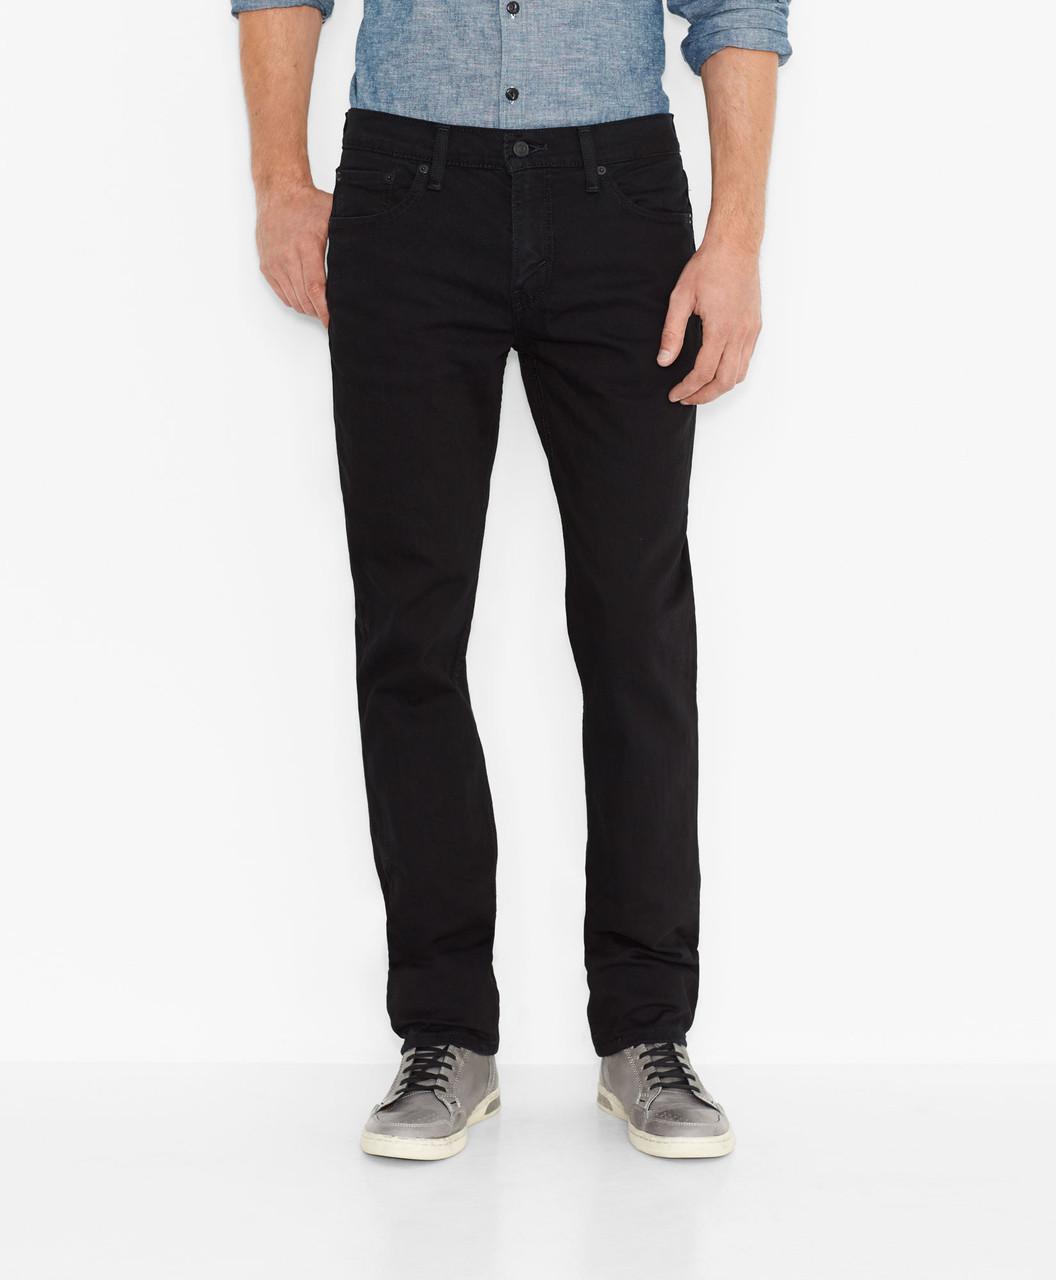 45815f9f363 Мужские джинсы Levis 511™ Slim Fit Jeans (Black Stretch) Черные ...